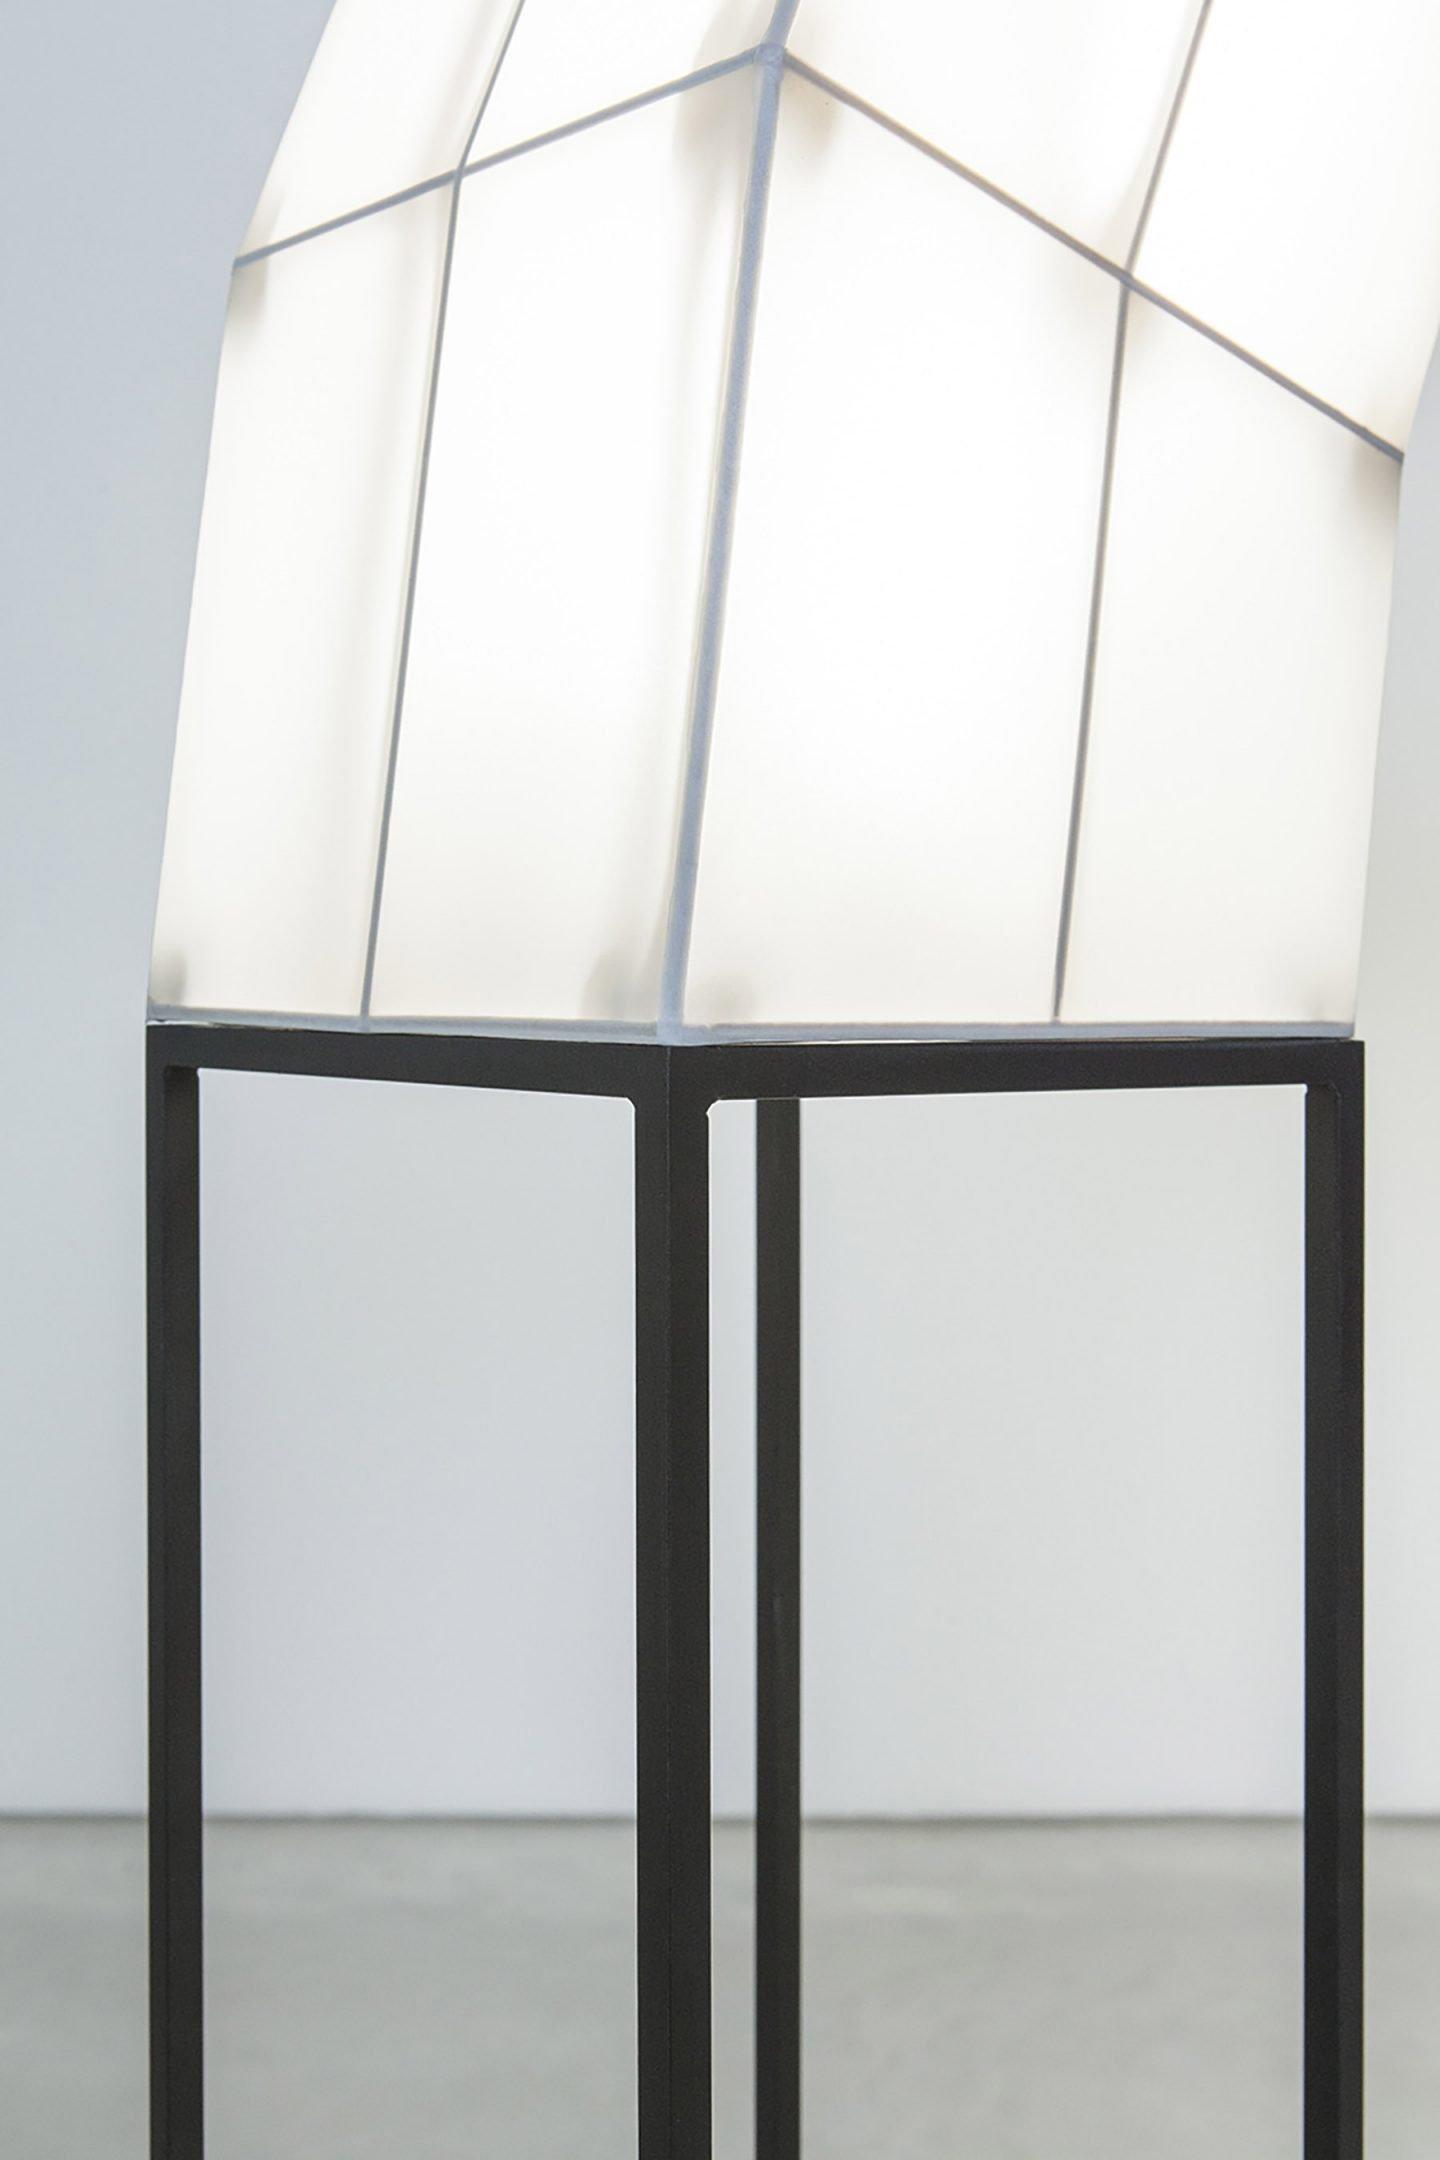 iGNANT-Design-Mieke-Meijer-Space-Frames-017